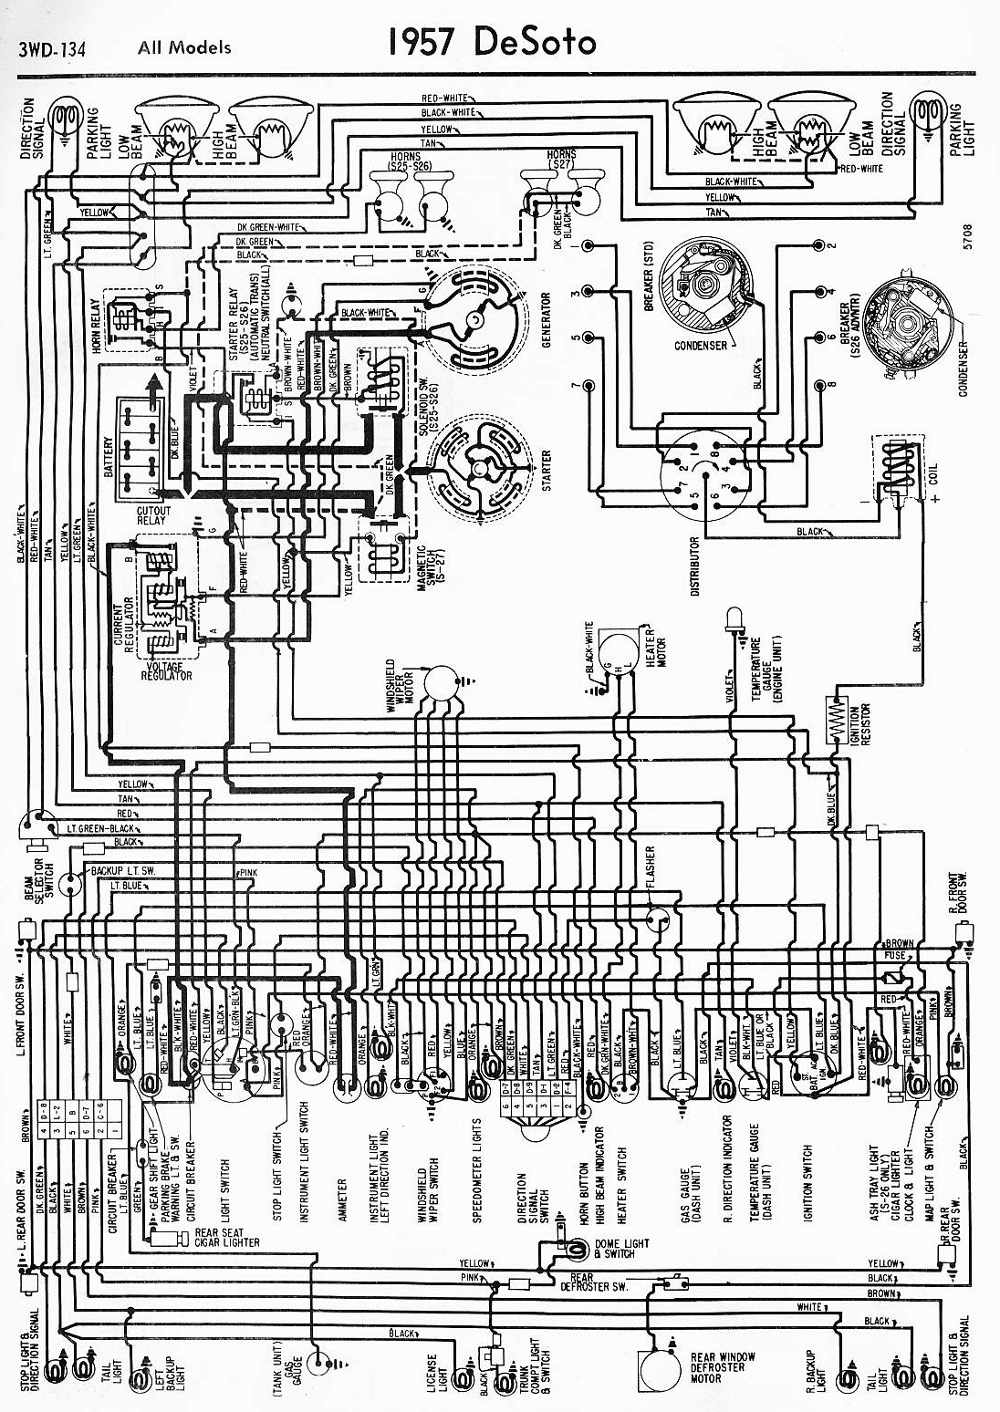 wiring diagrams of 1957 desoto all models?t=1508403749 de soto car manuals, wiring diagrams pdf & fault codes 1941 desoto wiring diagram at reclaimingppi.co